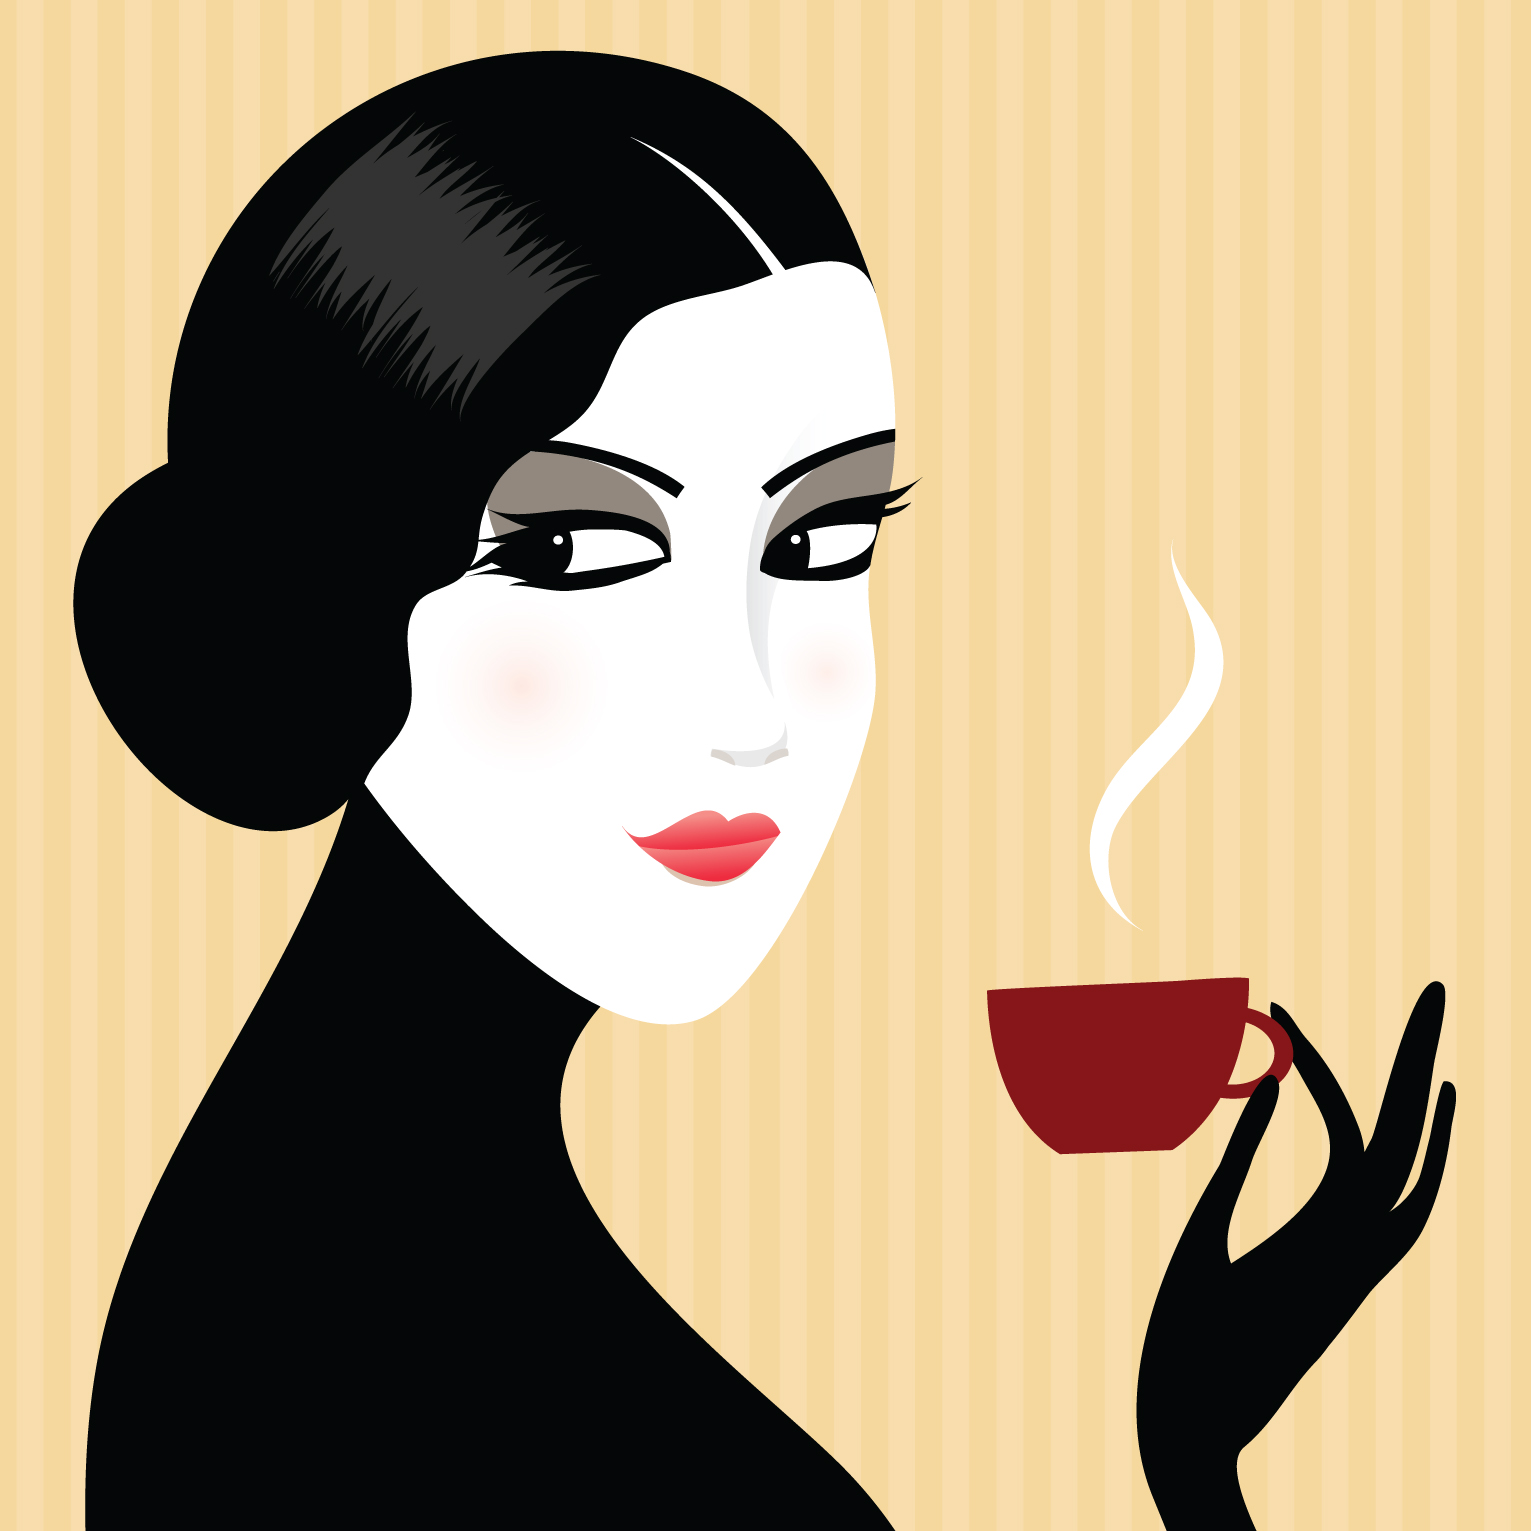 Woman illustration photo